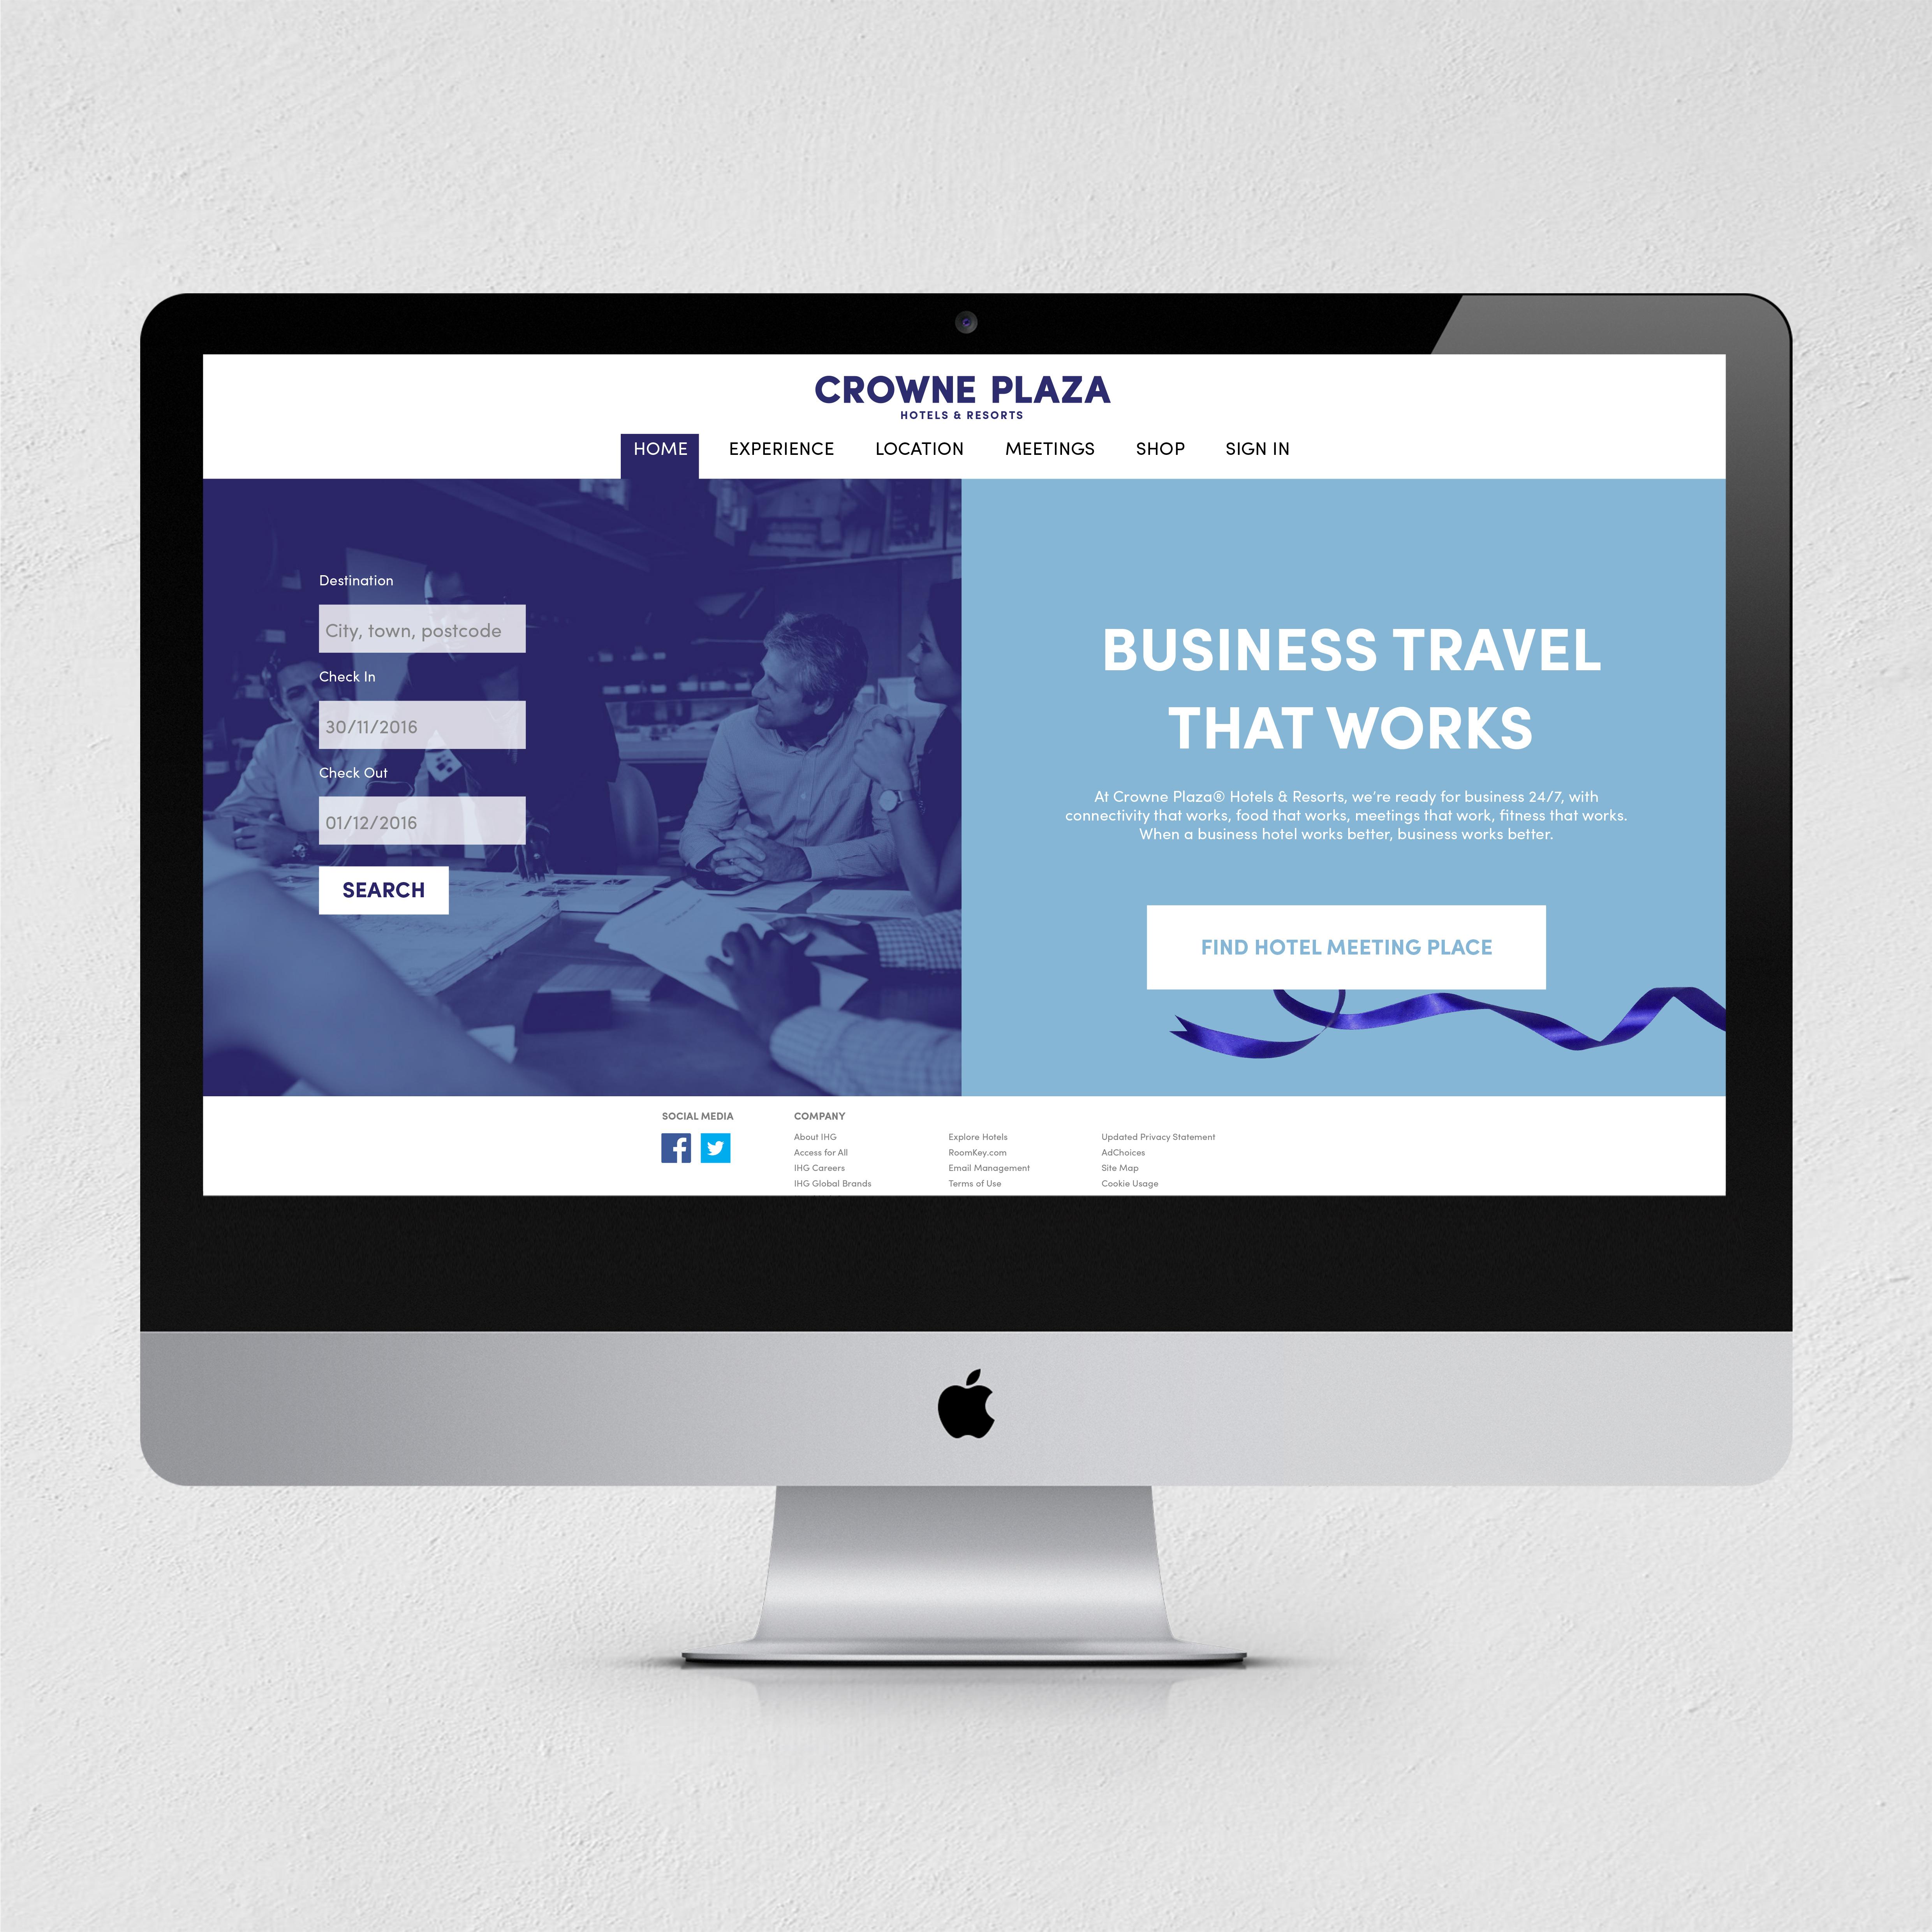 crowne plaza website